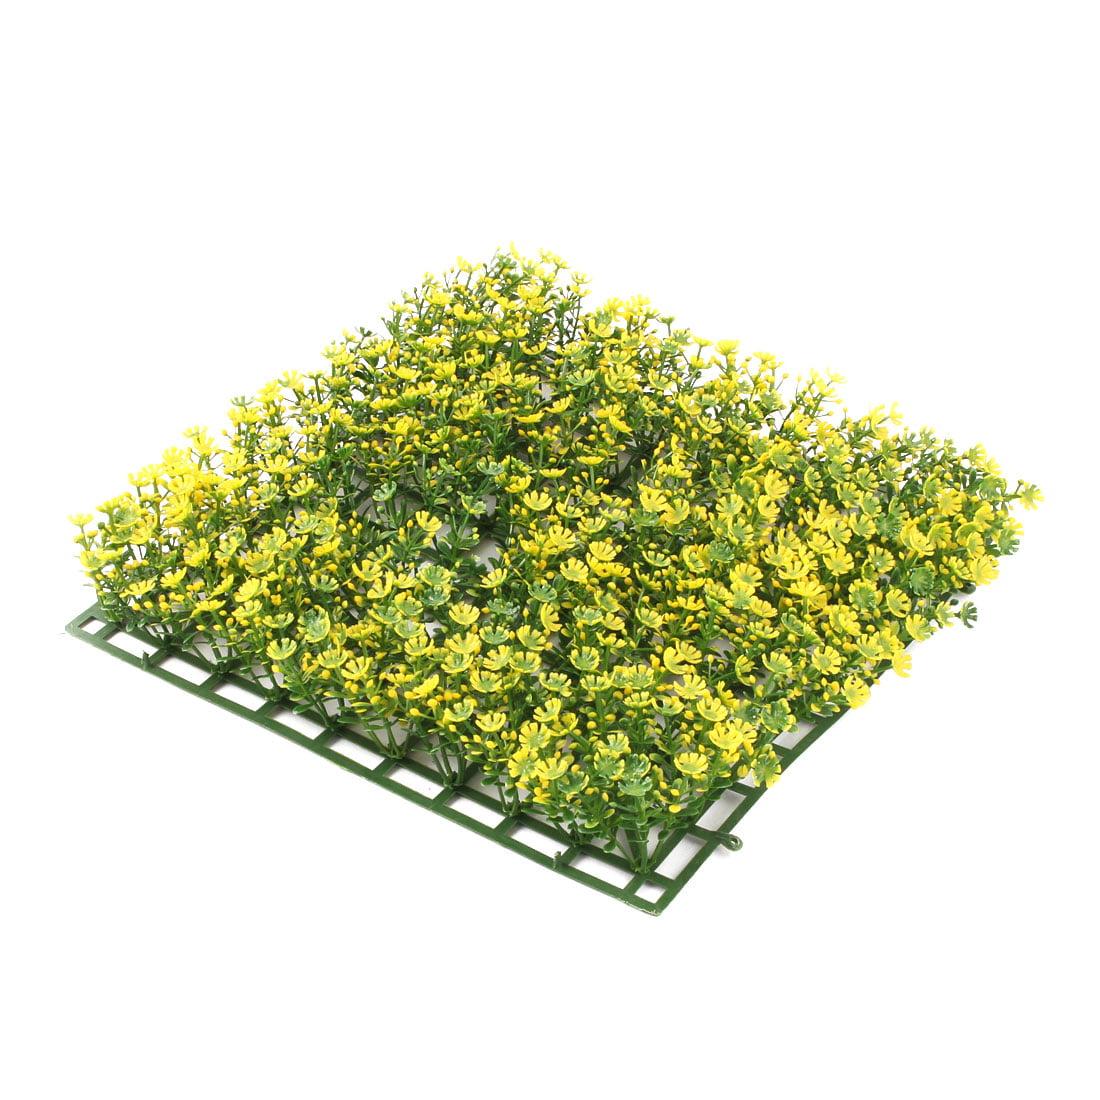 Aquarium Fish Tank Plastic Grass Plant Lawn Landscape Ornament Yellow Green